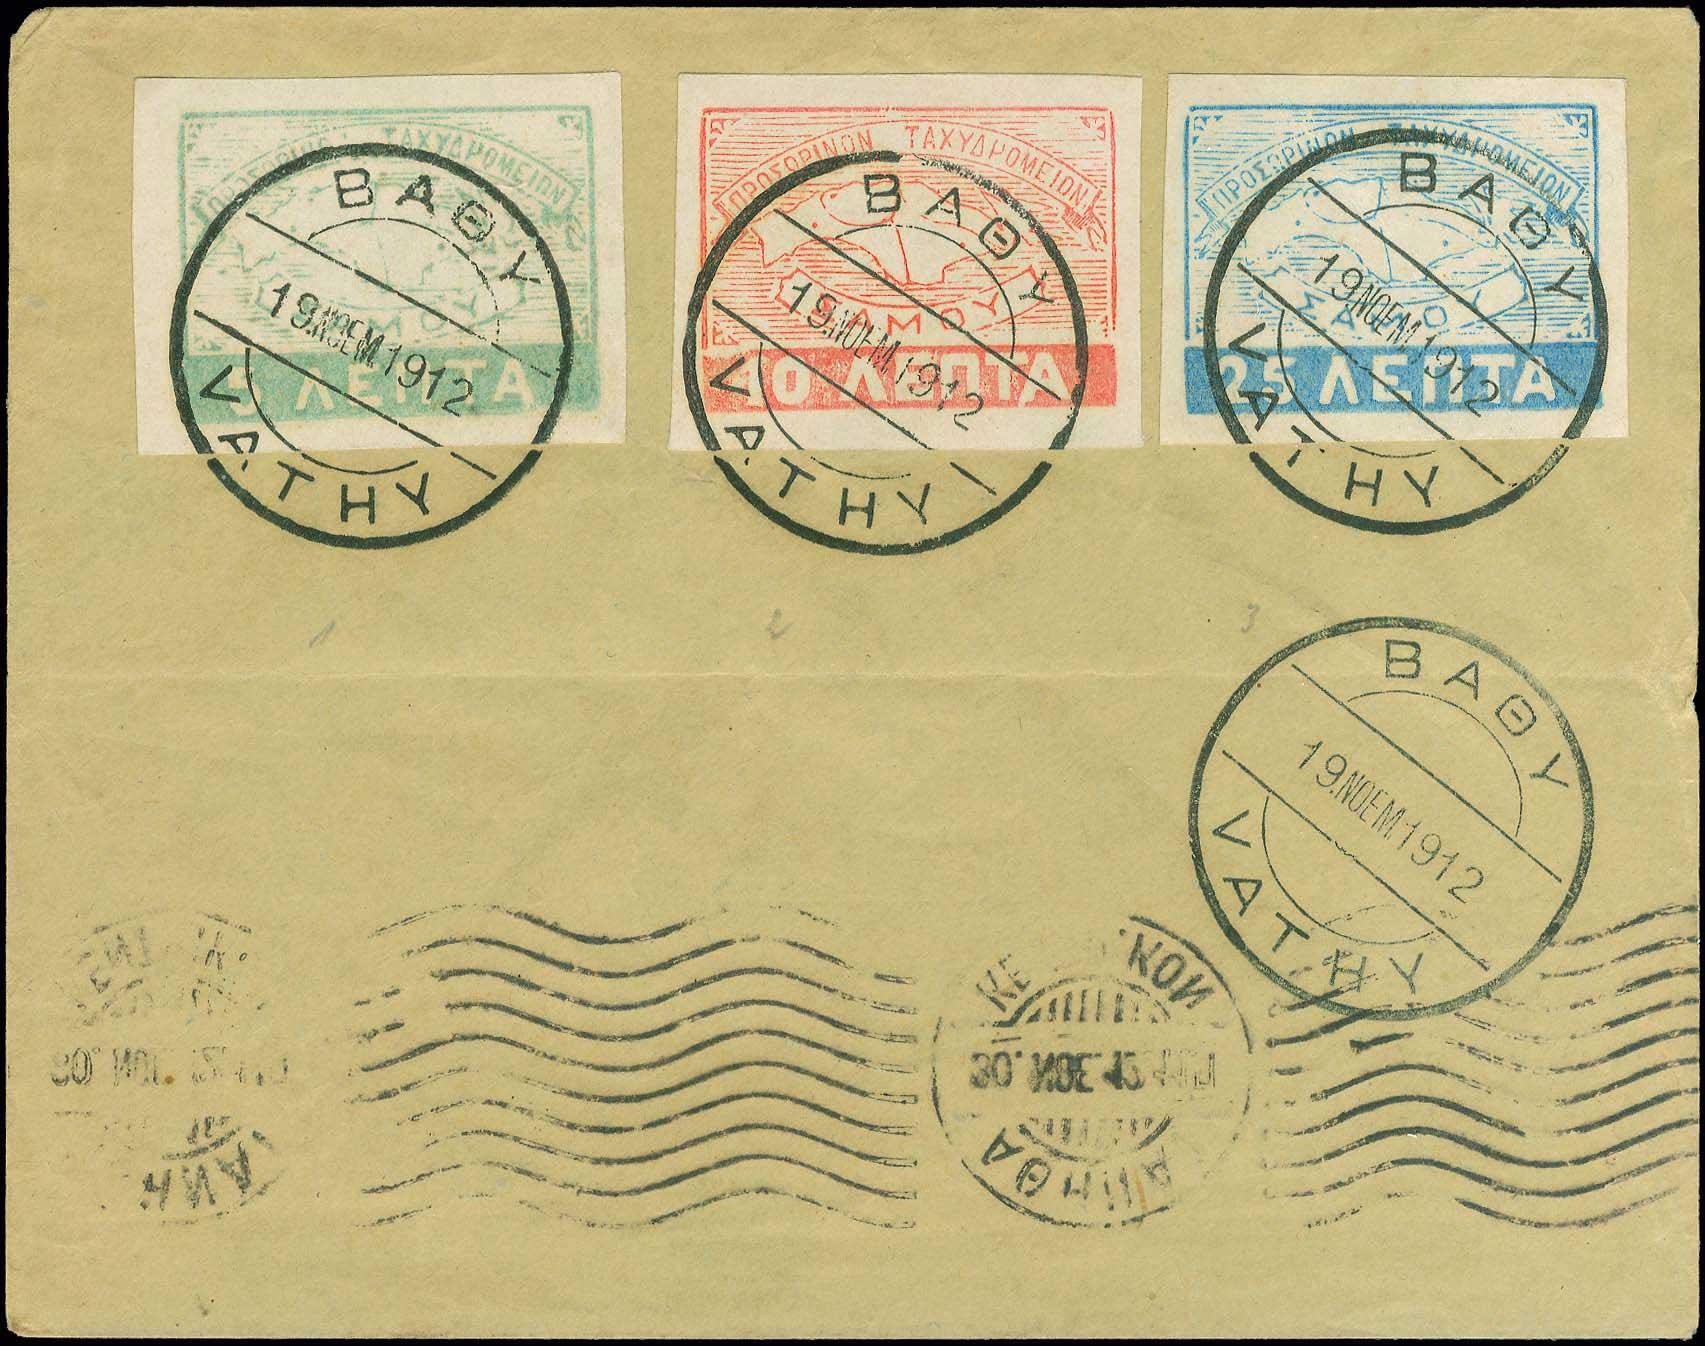 Lot 779 - -  SAMOS ISLAND Samos Island -  A. Karamitsos Postal & Live Internet Auction 681 General Philatelic Auction